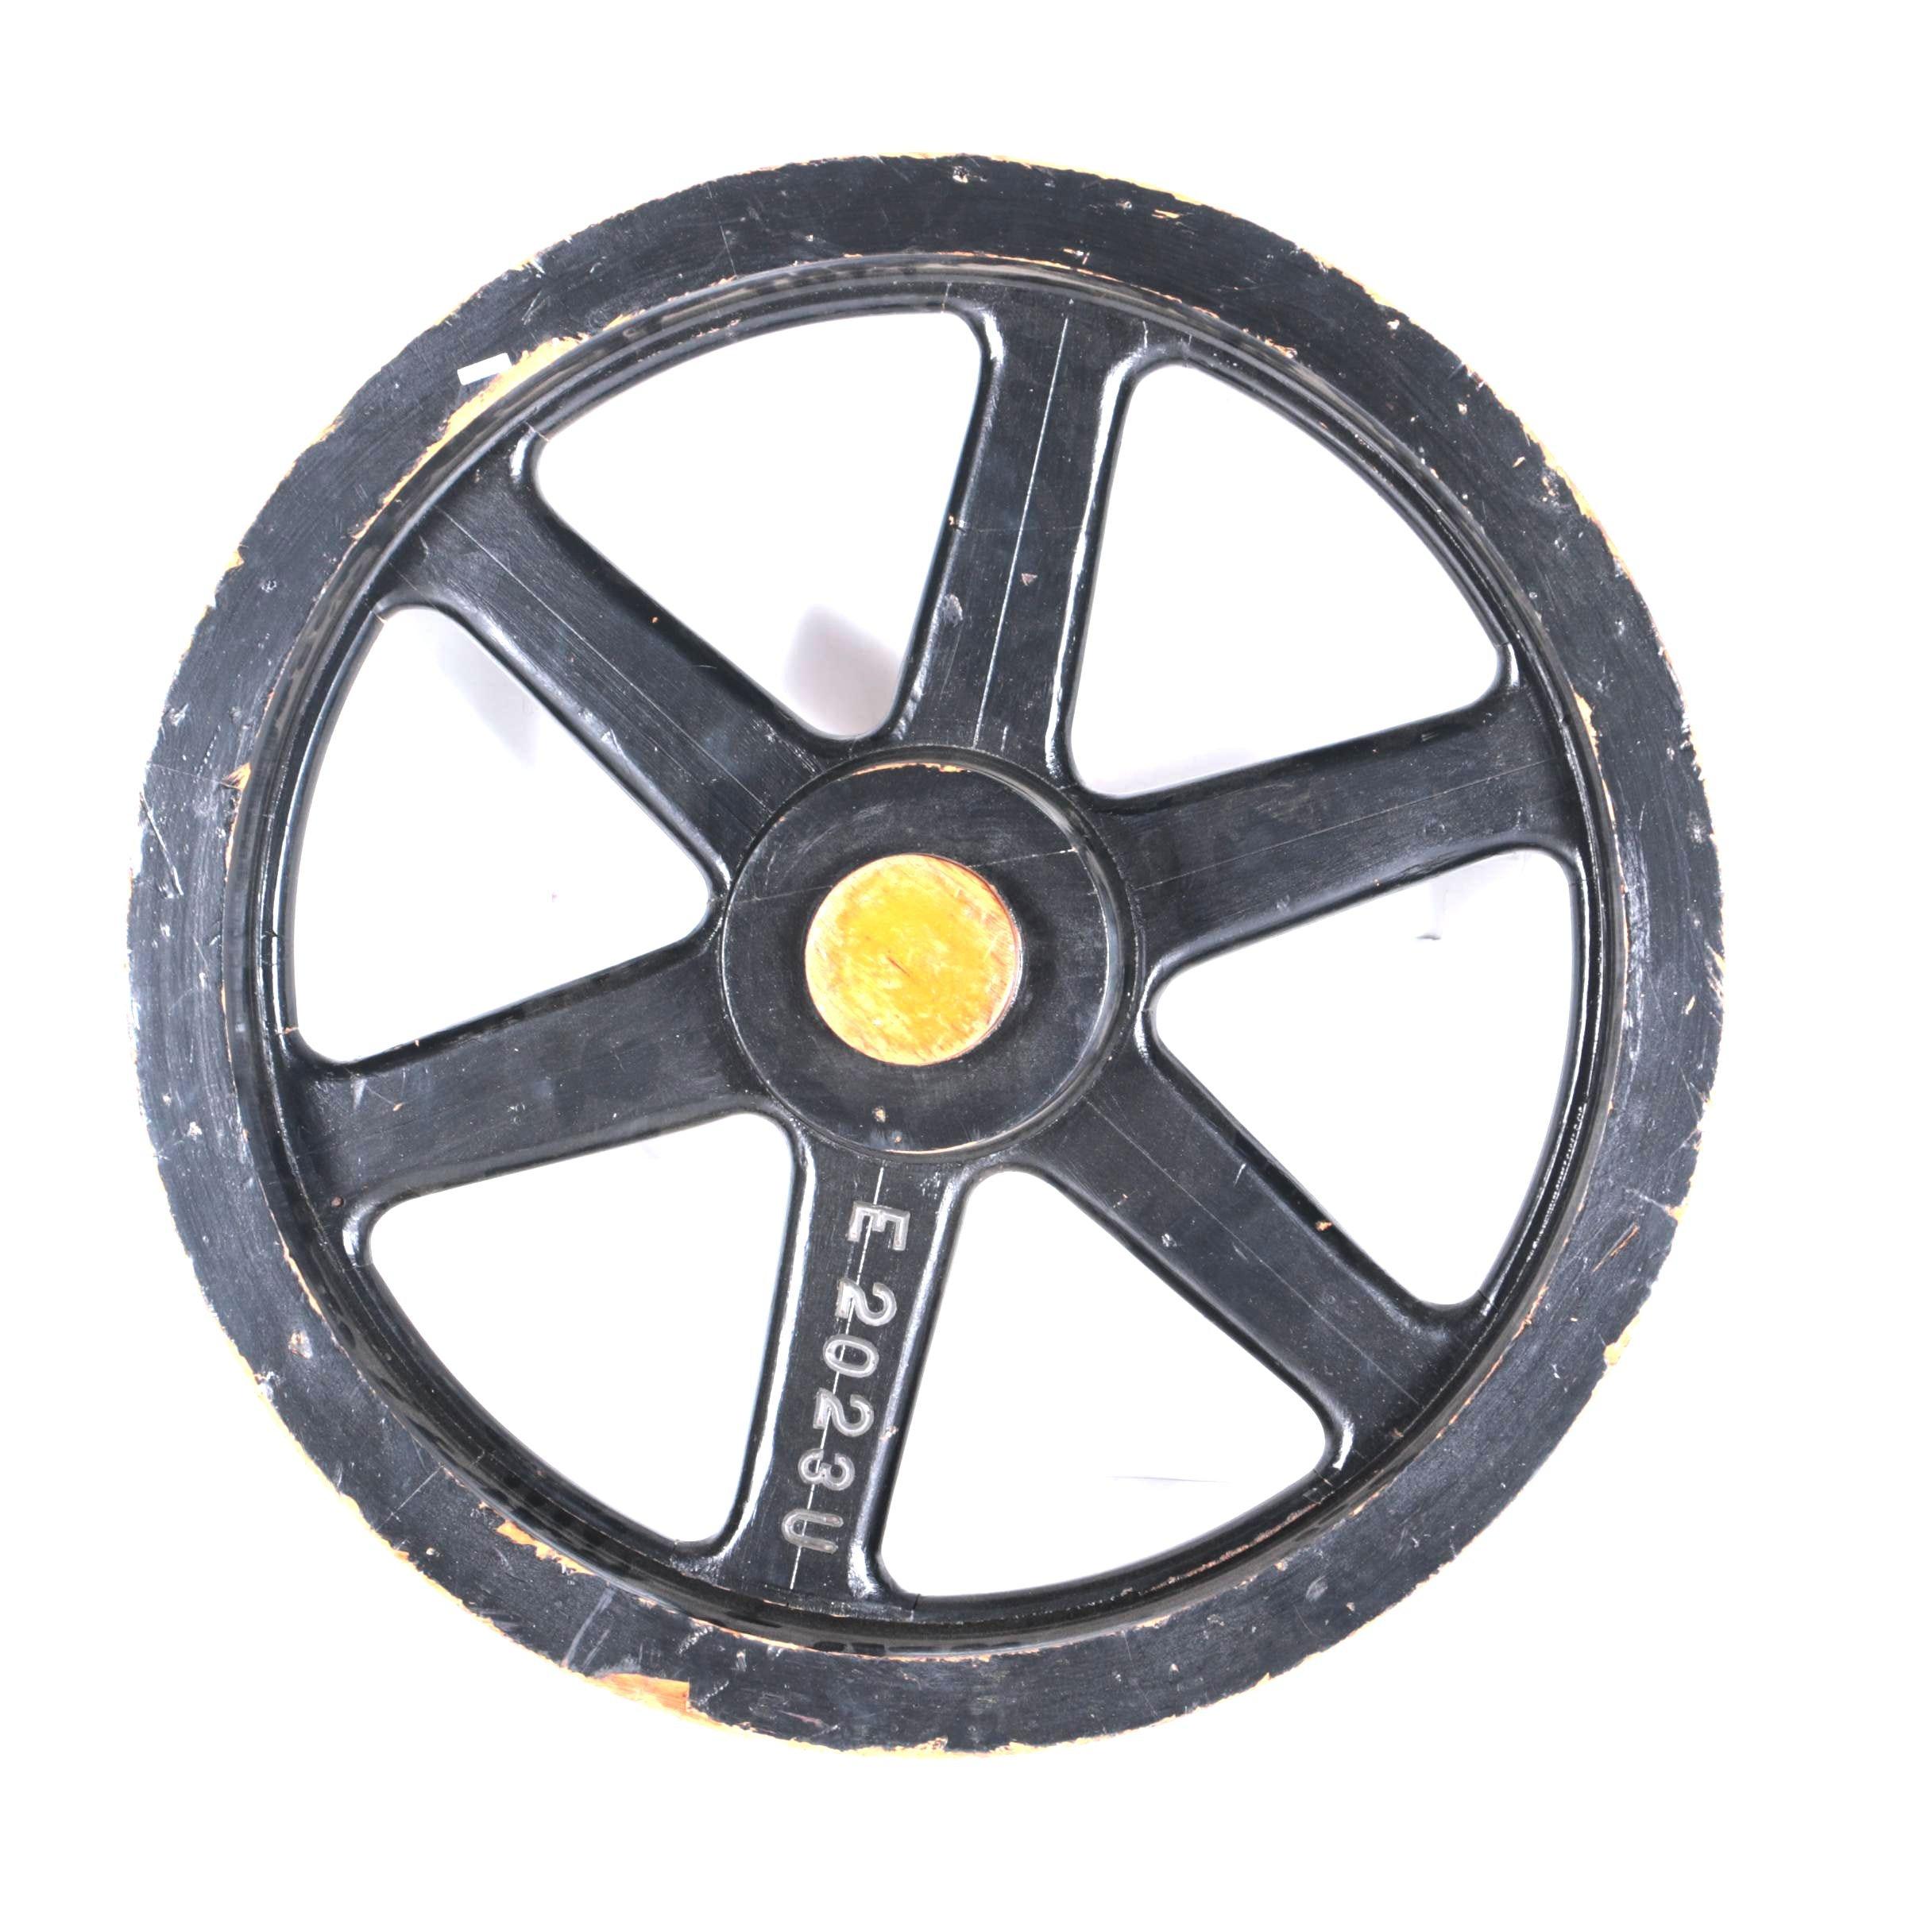 "Wooden 6-Spoke 32"" Wagon/Automobile Wheel"